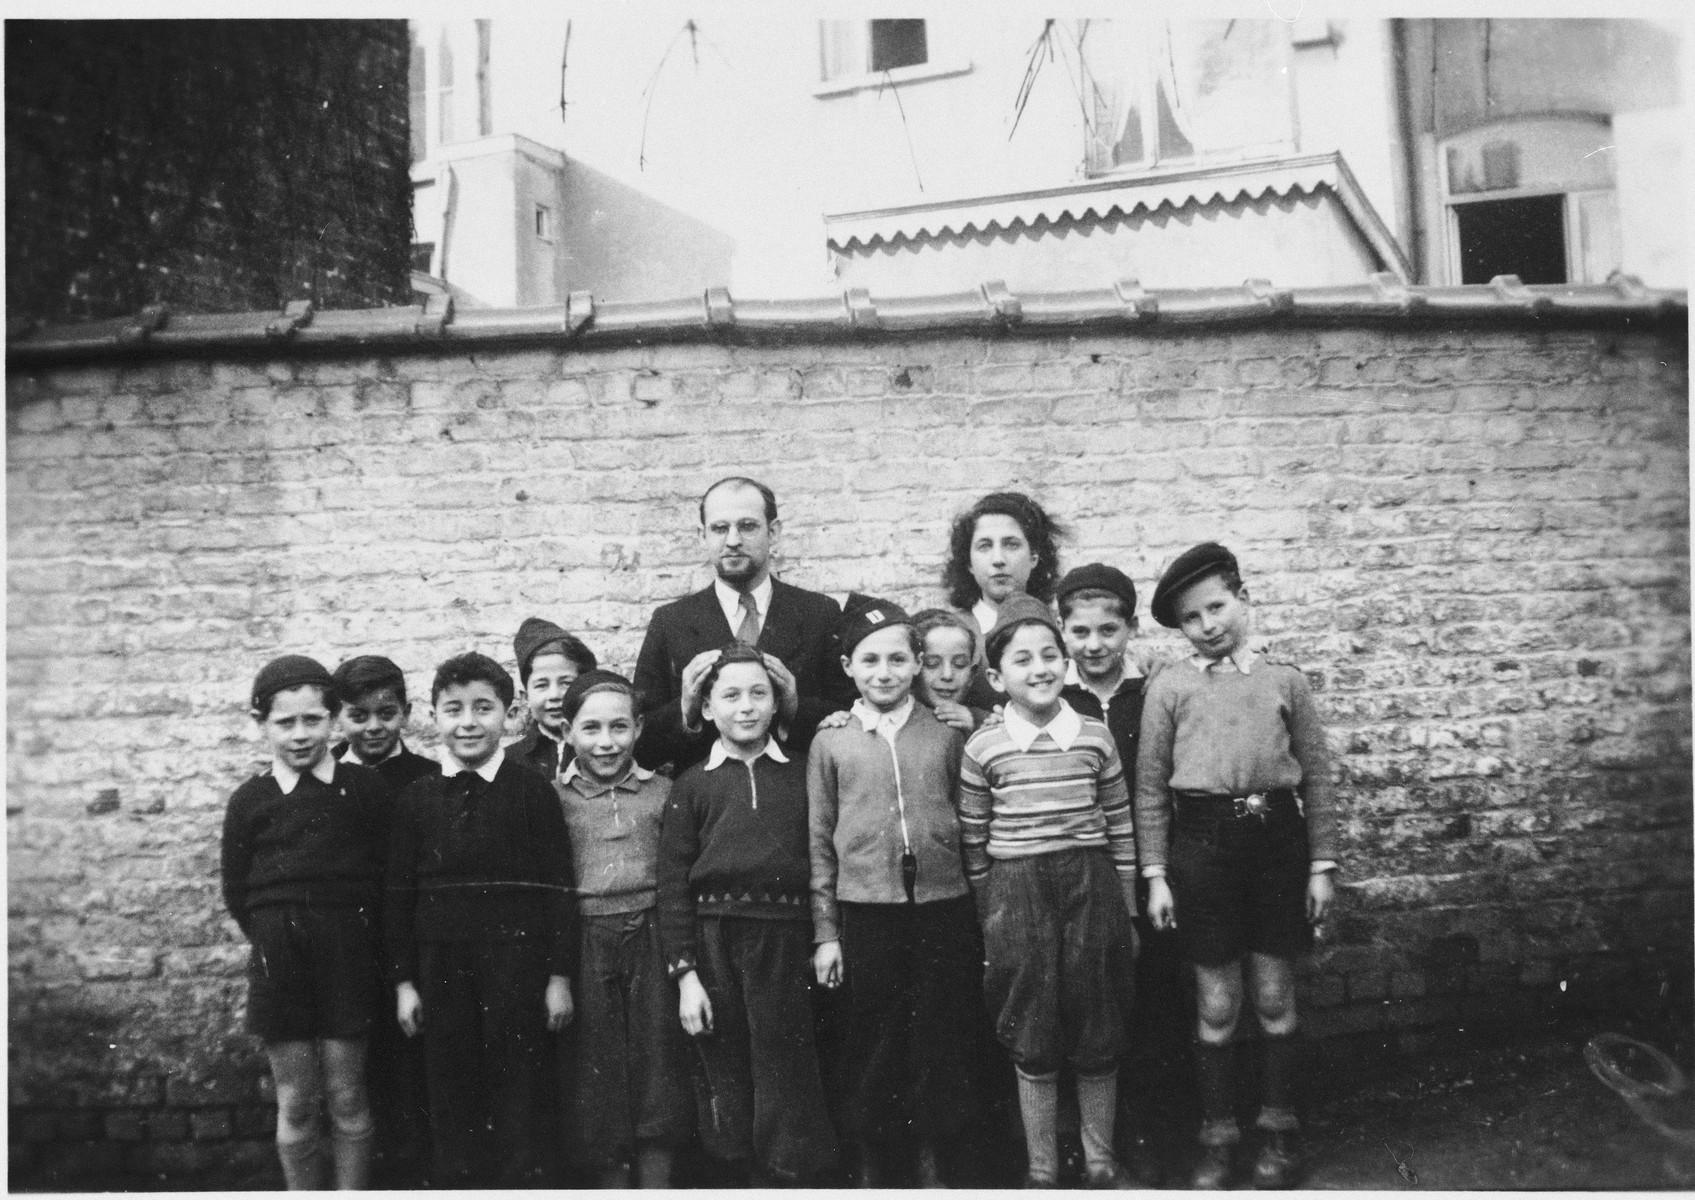 Group portrait of Jewish DP orphans at the Mariaburg children's home near Antwerp.